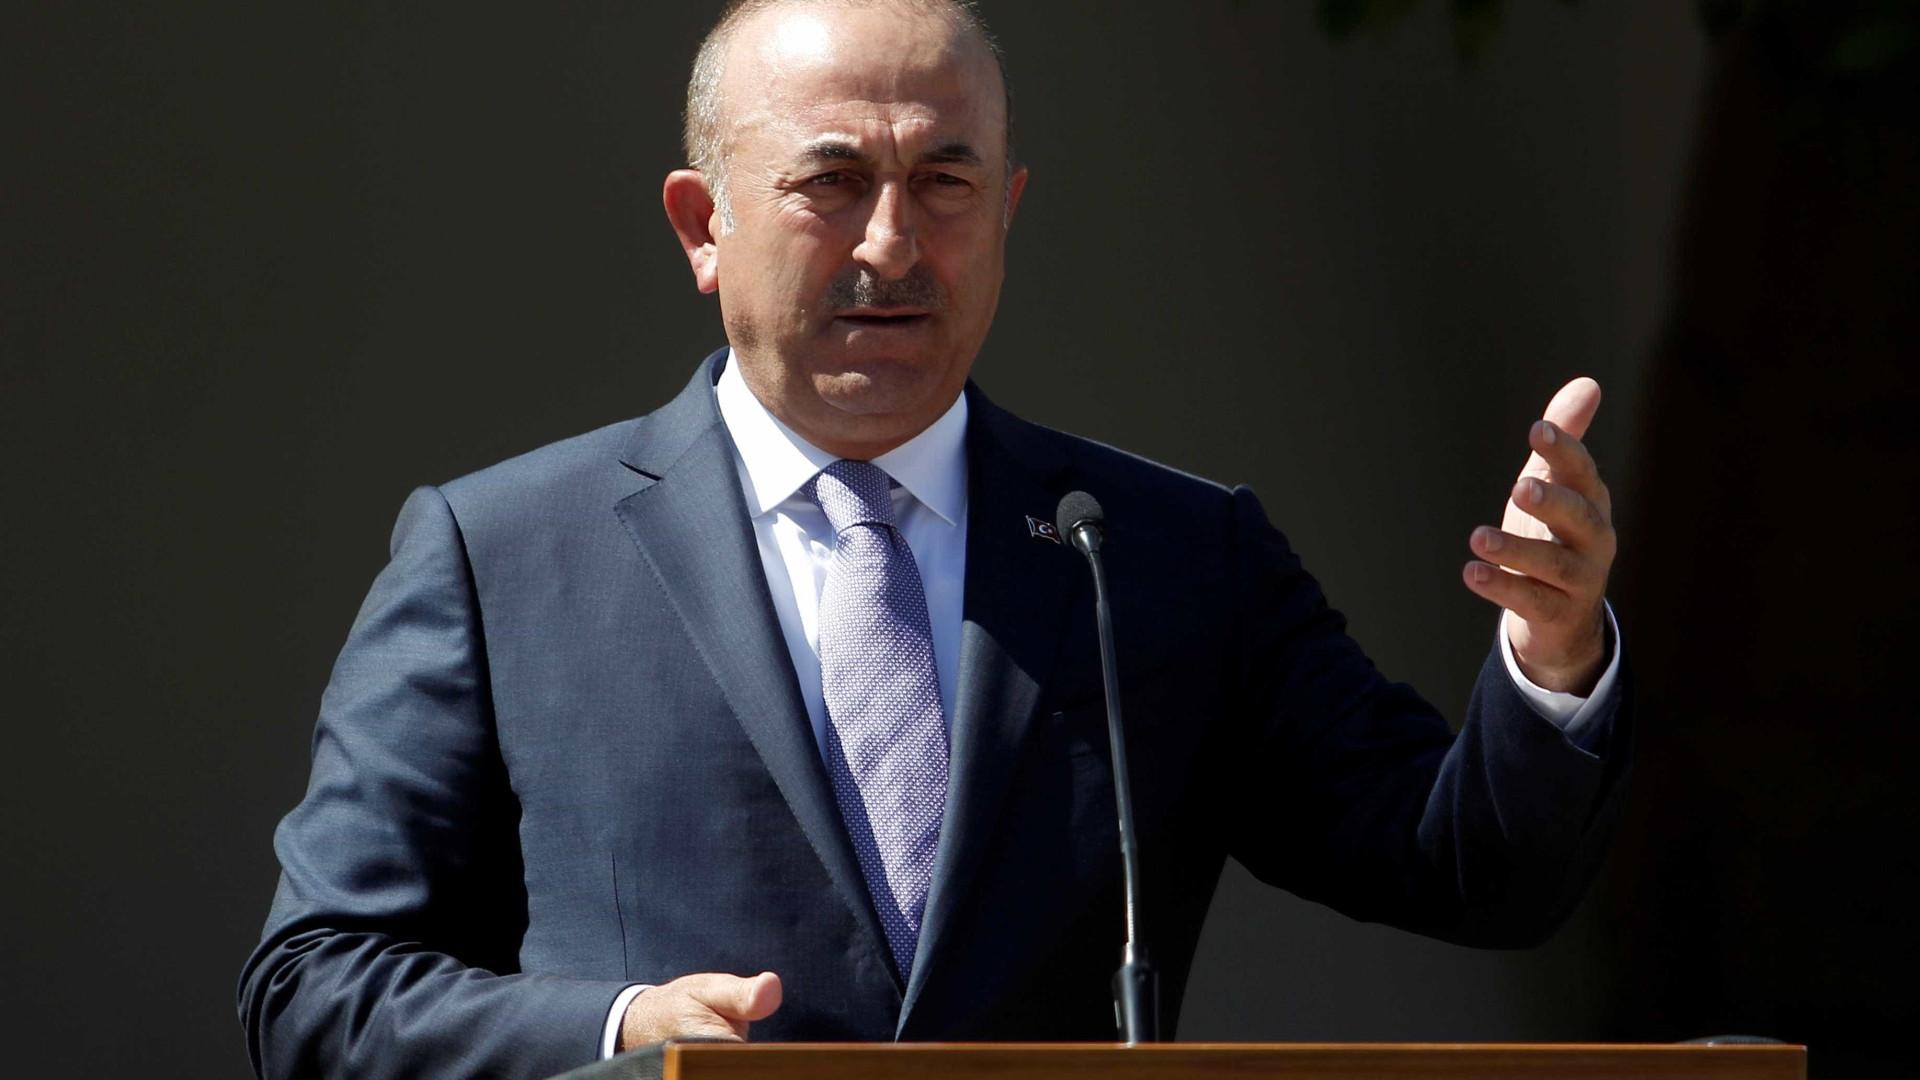 Turquia vai boicotar produtos eletrónicos dos EUA